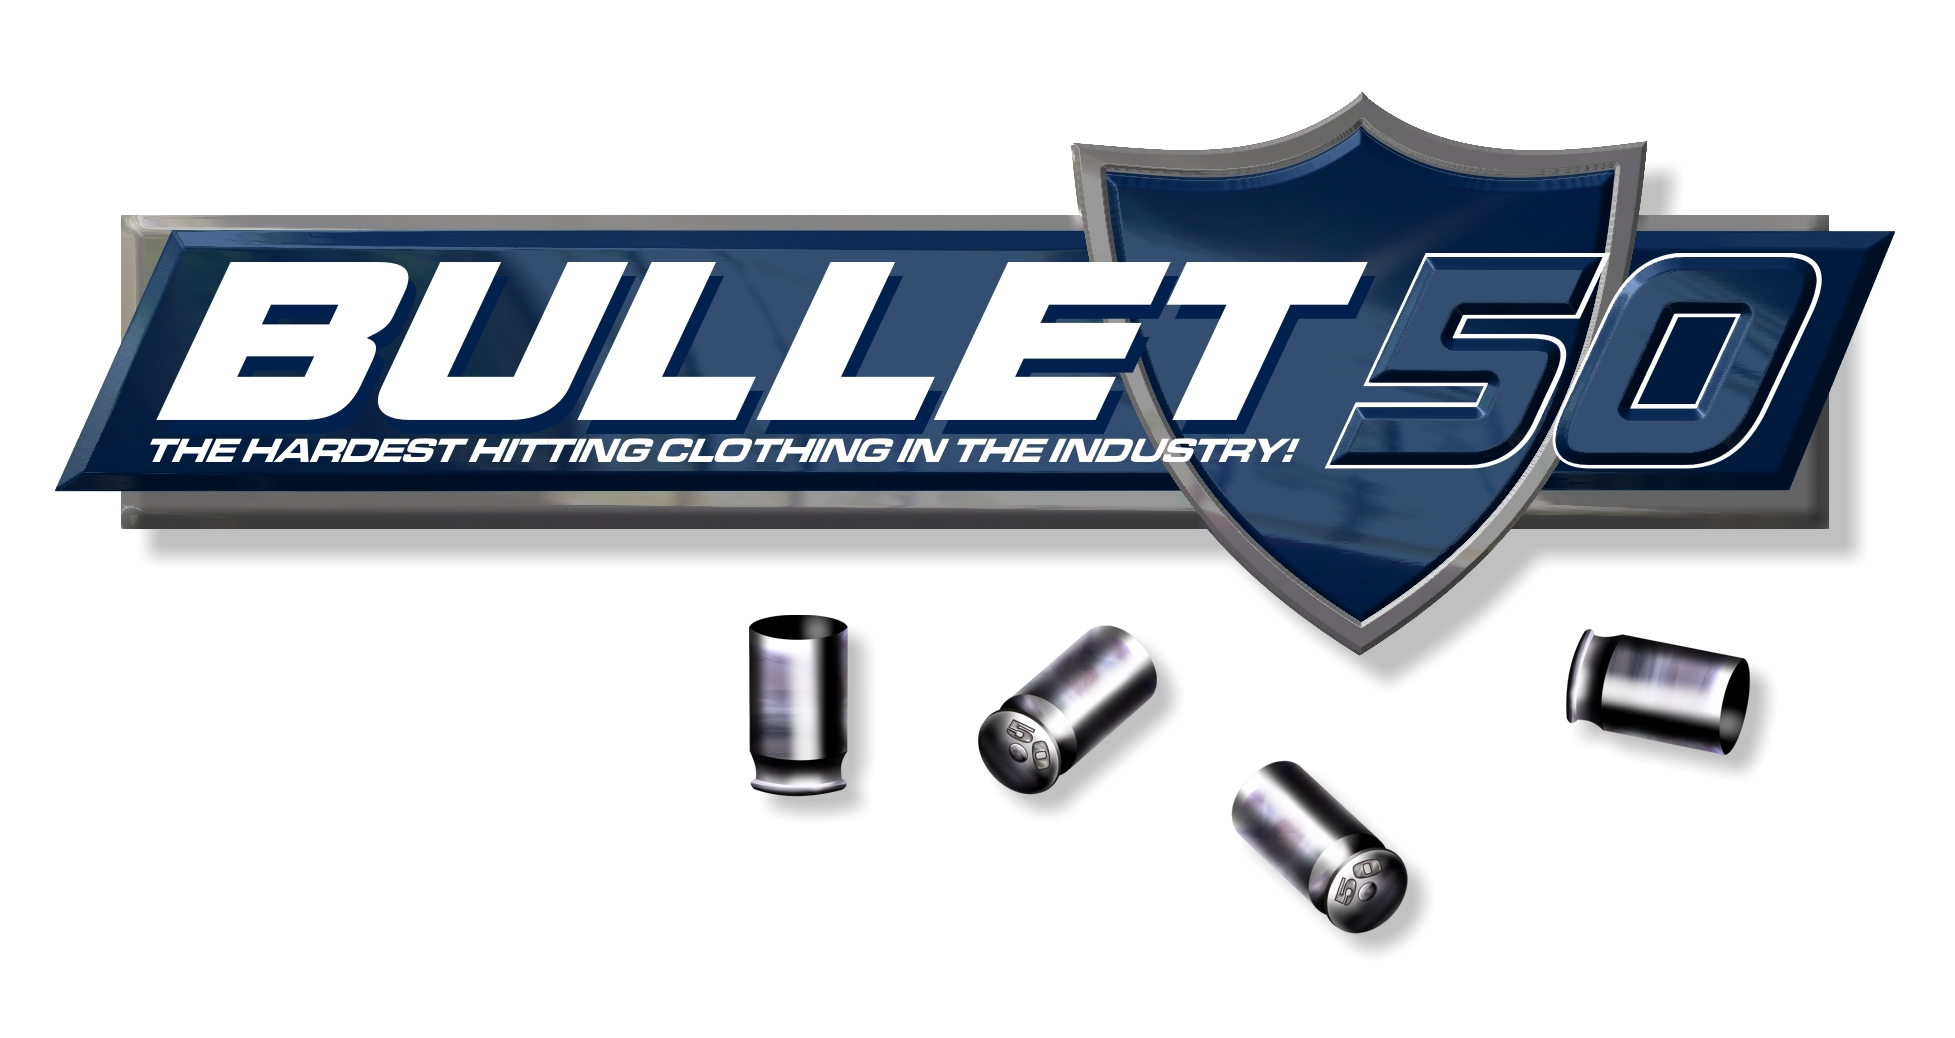 BULLET50